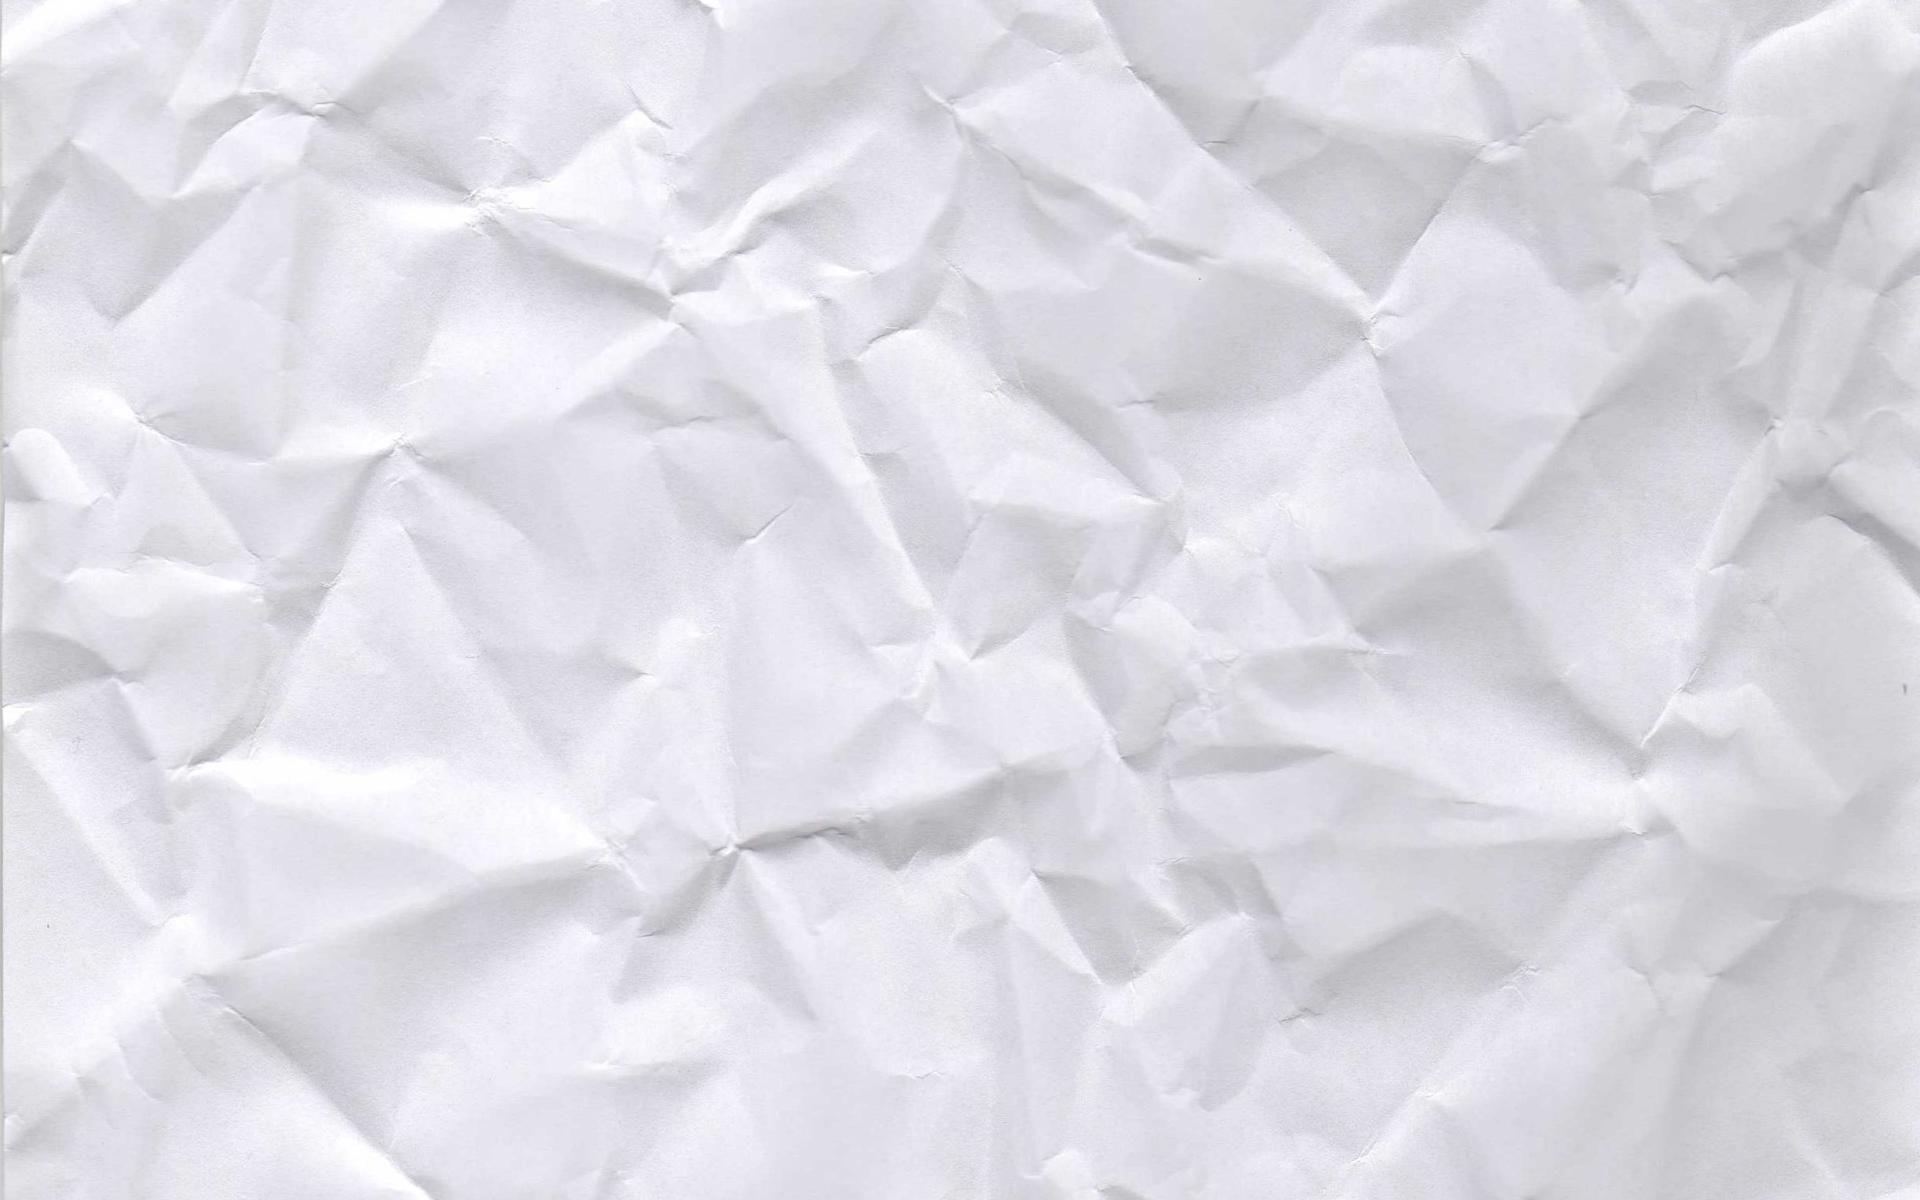 crumpled paper texture - Ideal.vistalist.co